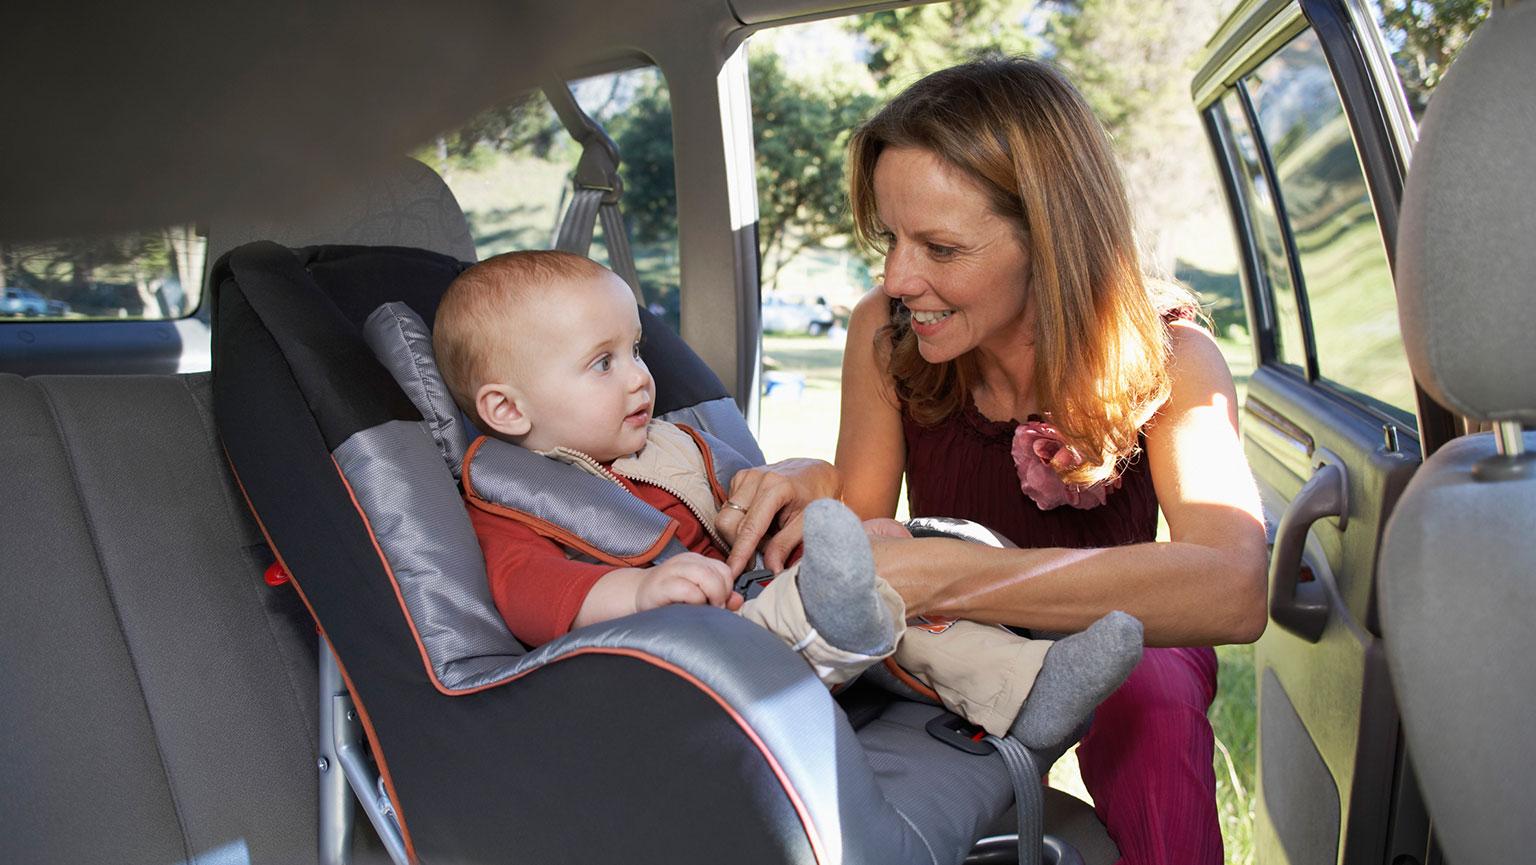 Фото мамы и ребенка в машине